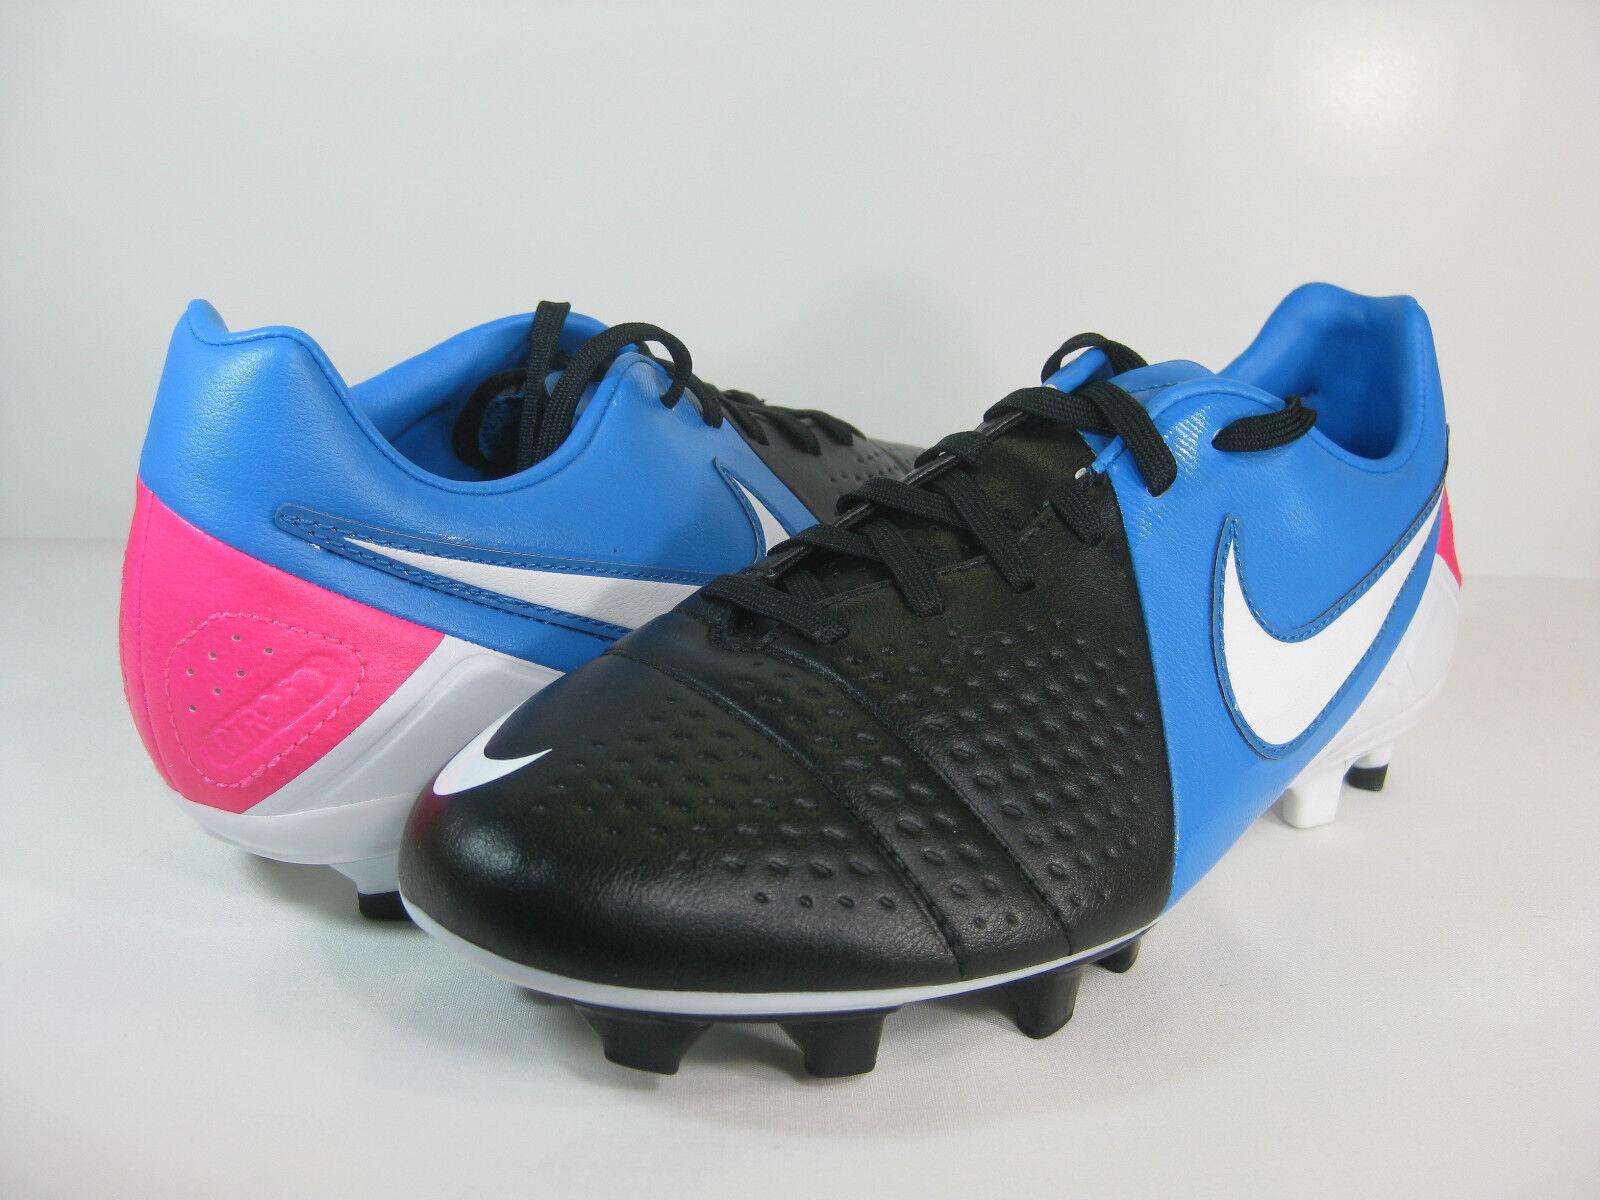 NIKE MENS CTR360 LIBRETTO III FG Black/White-Photo Blue-Pink Flash -525170 014-  Wild casual shoes